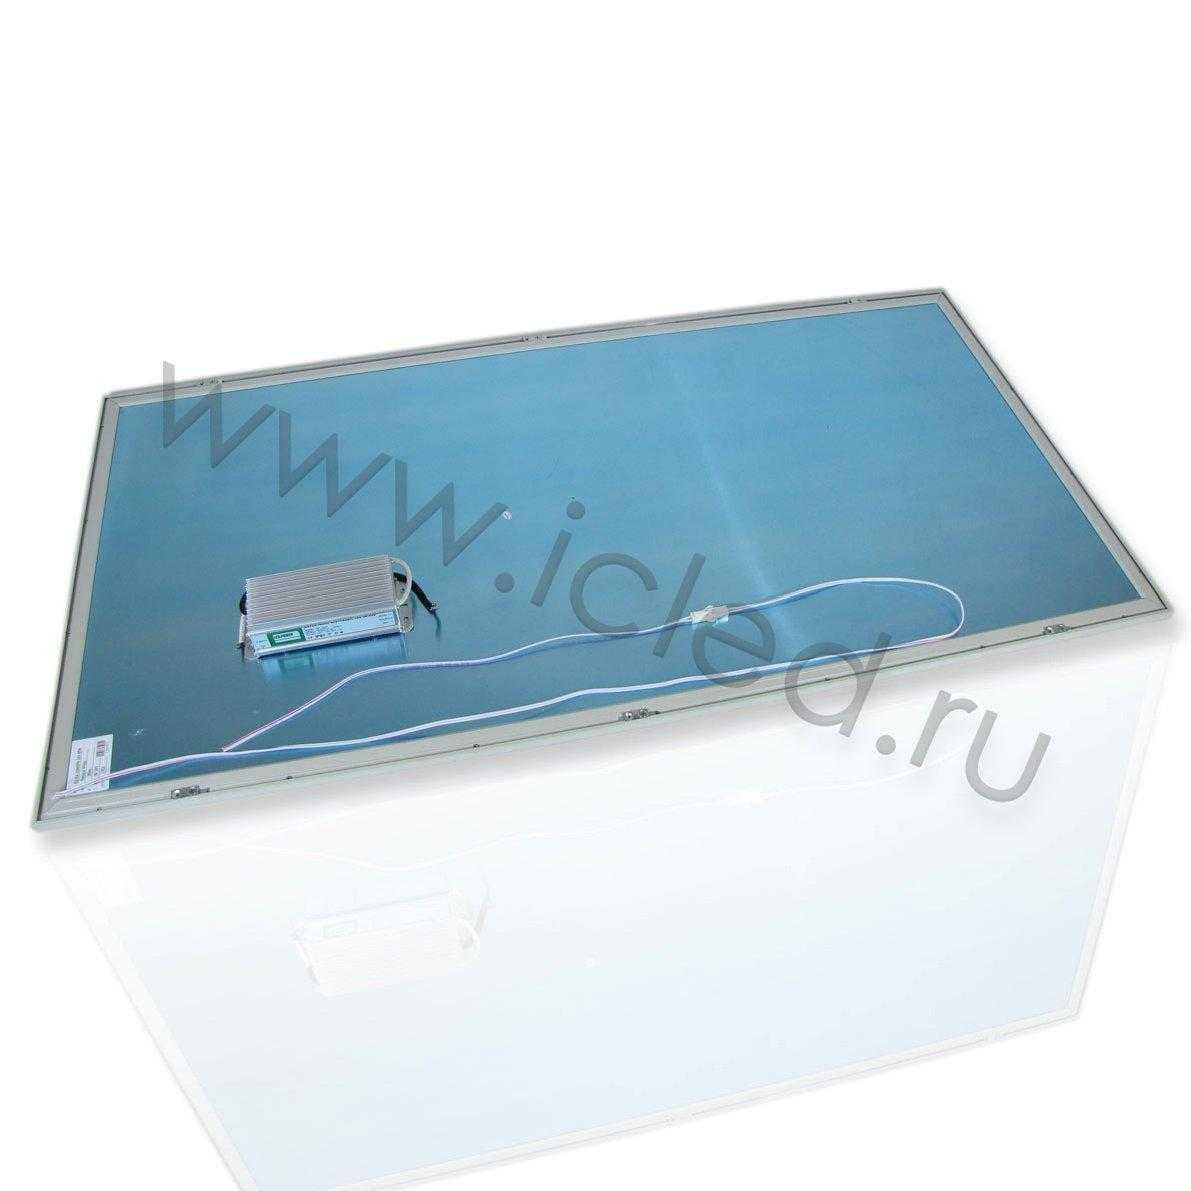 Светодиодная панель 600x1200 (90W, 220V, Warm White)